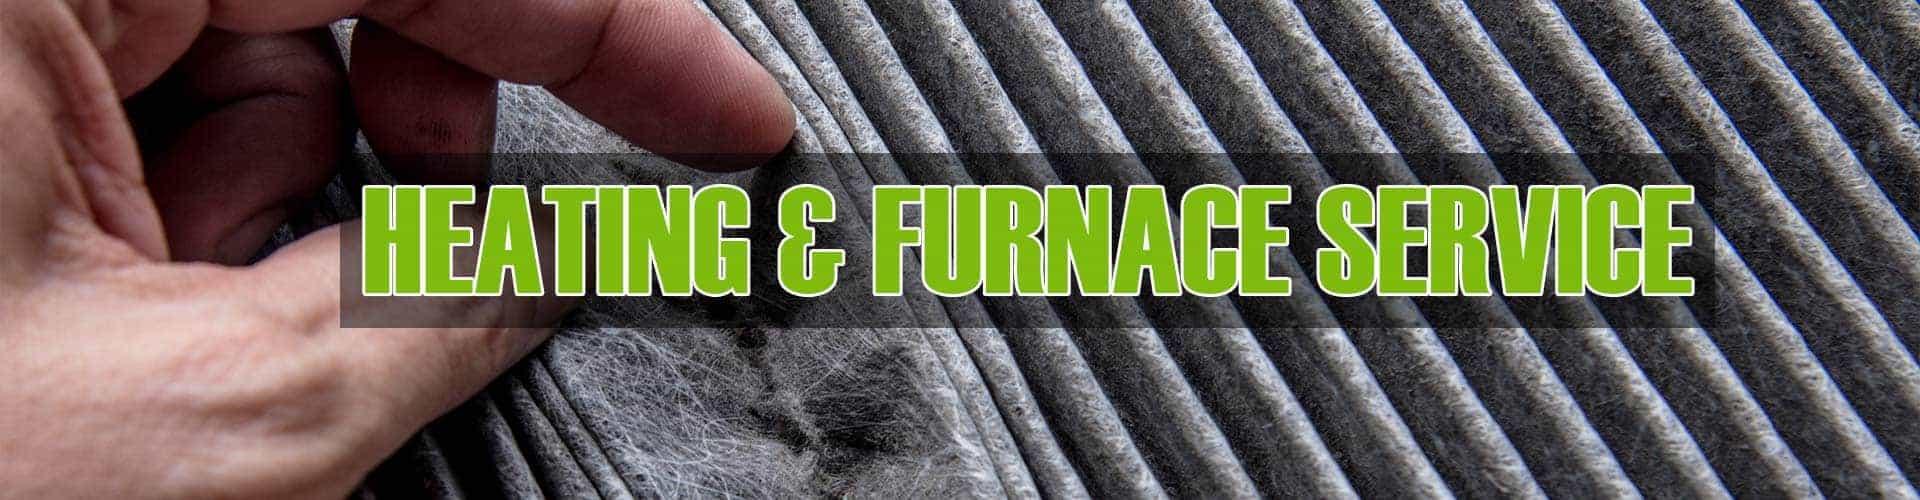 Heating Service & Furnace Service Elgin, Illinois Heating Repair Company